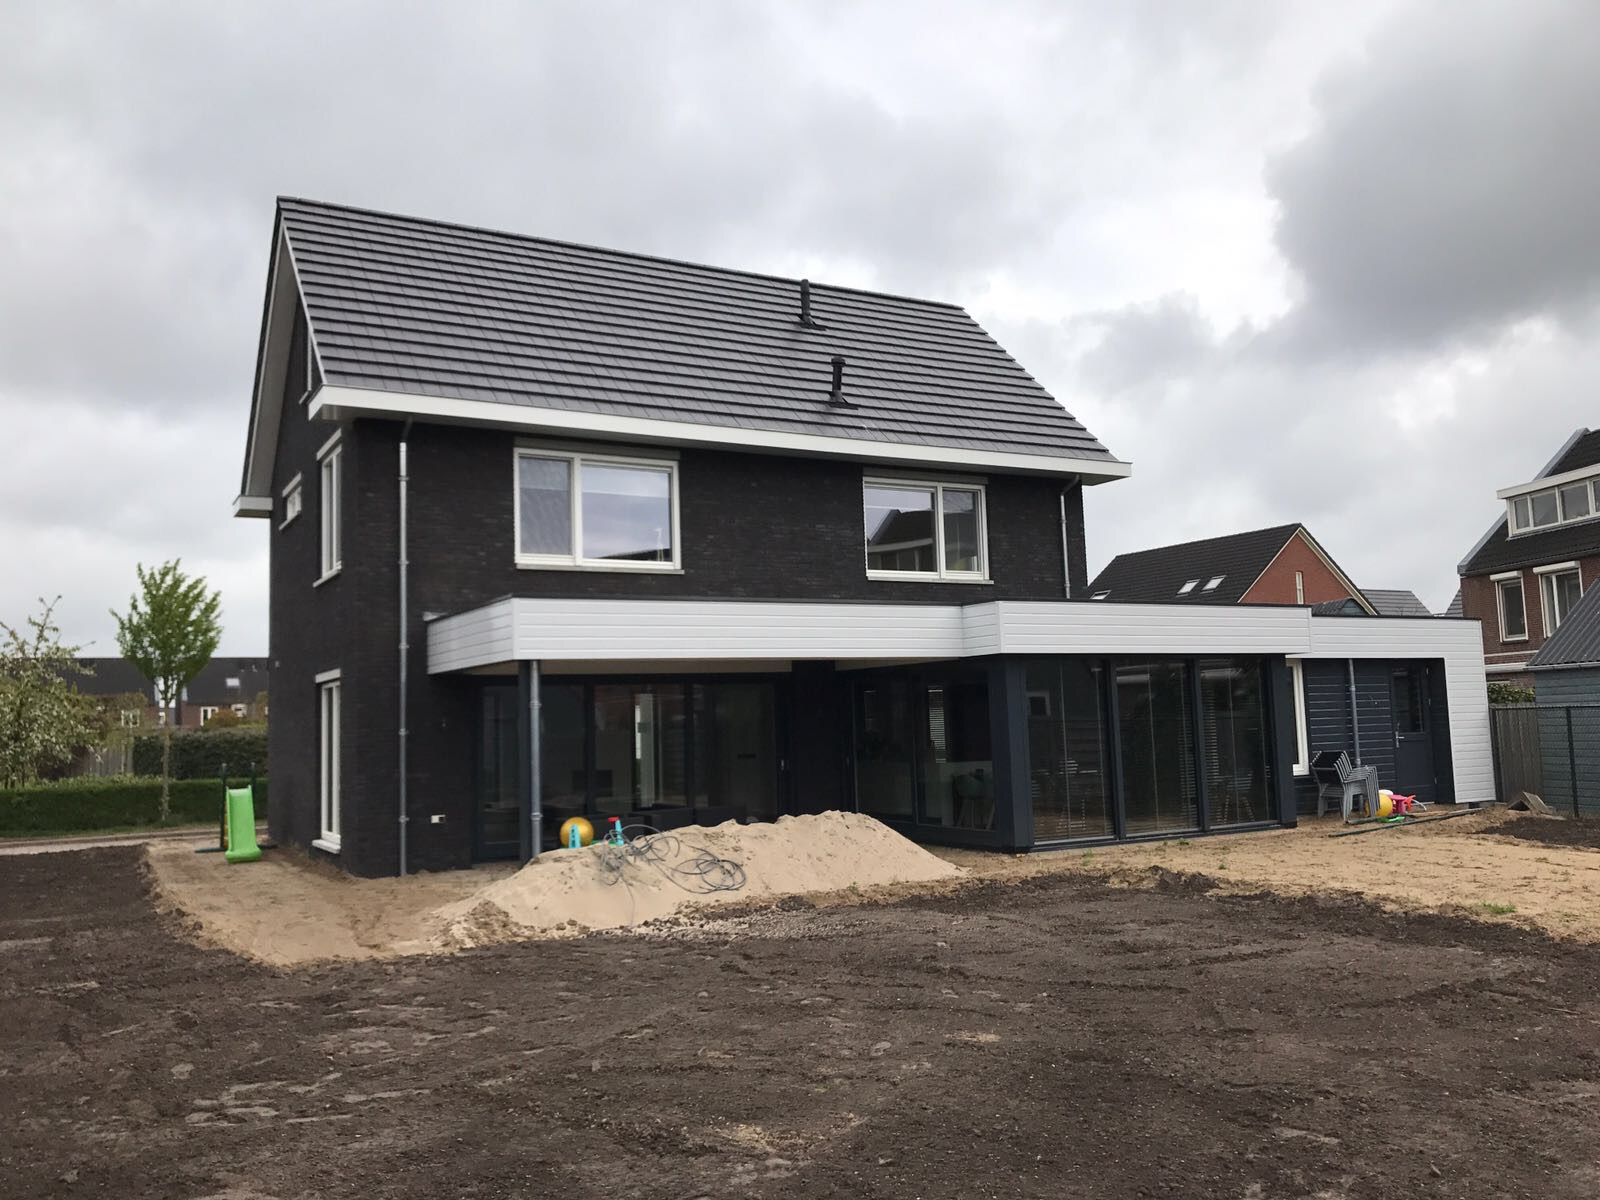 http://uploads.metsander.nl/huis-4-20170727.JPG